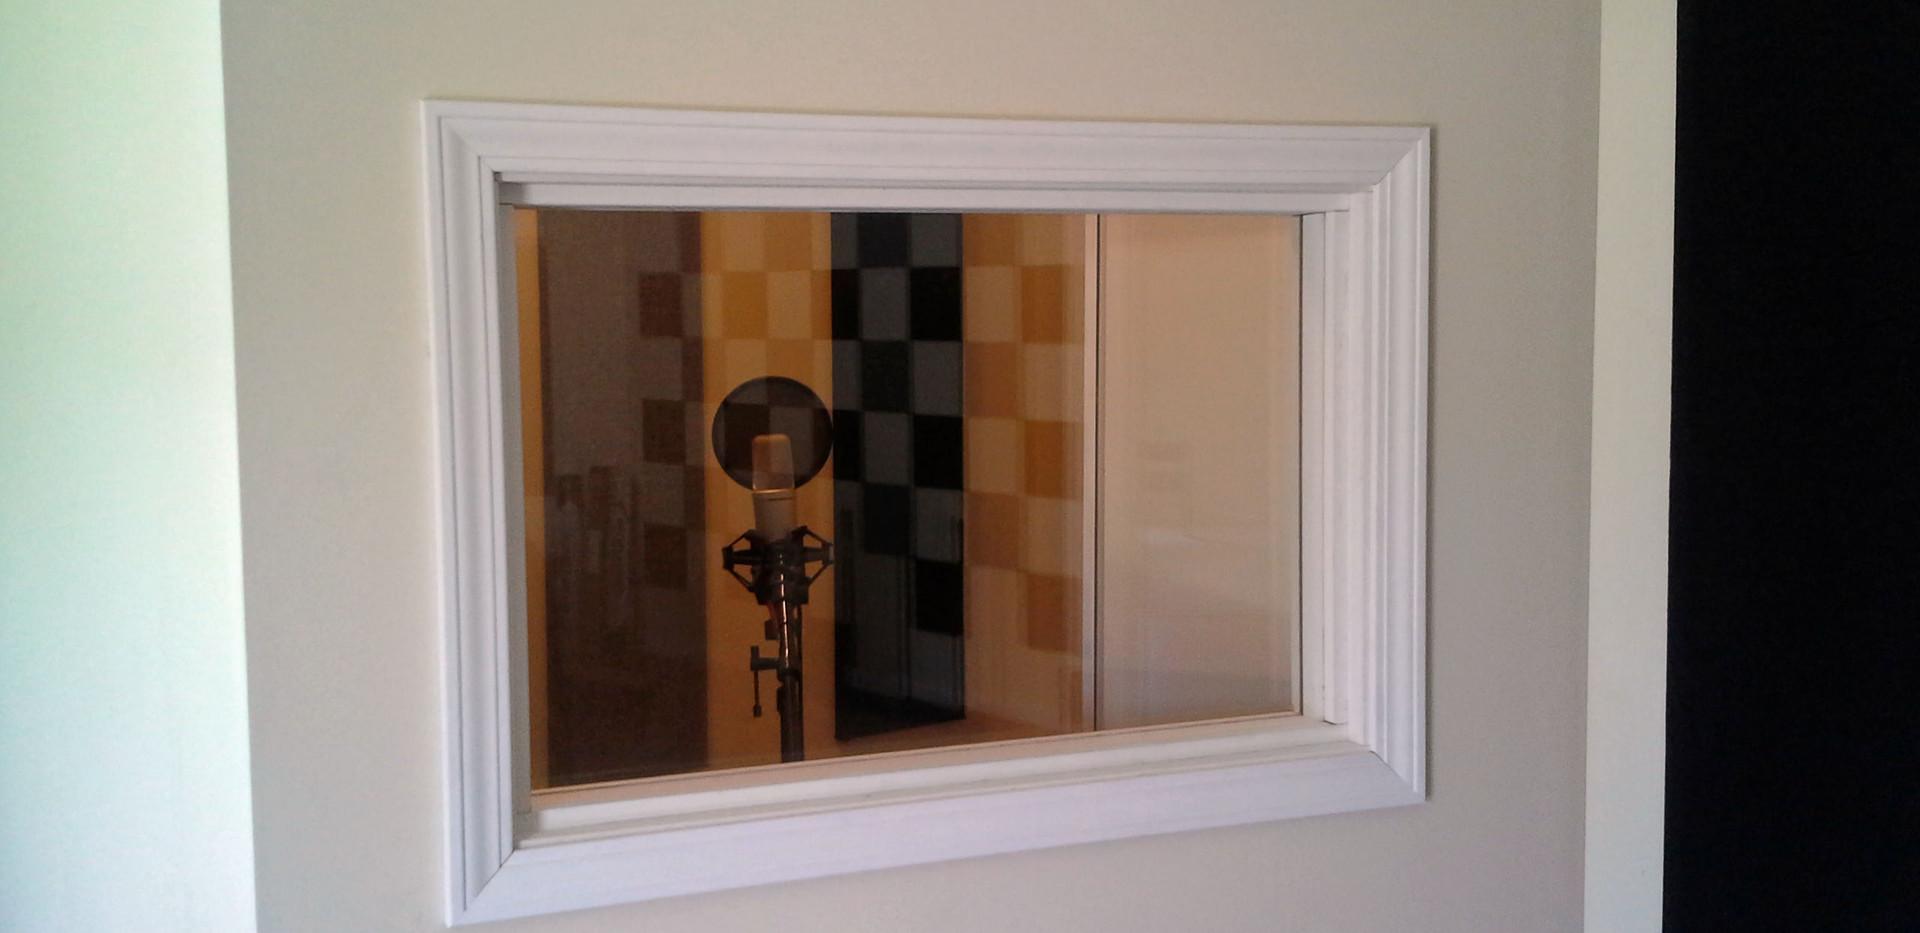 Webpage soundroom (6).jpg